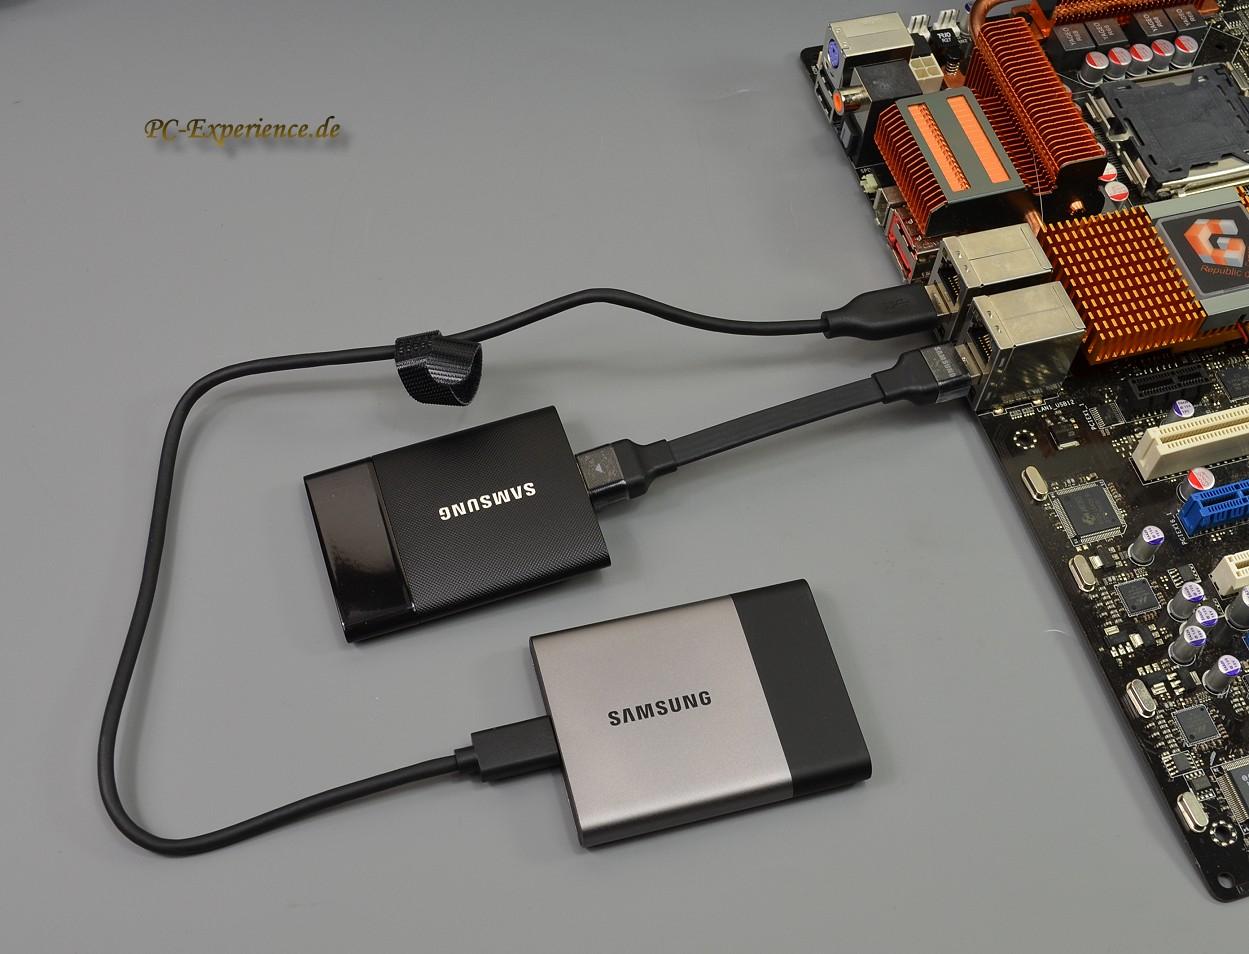 PC-Experience - das IT-Portal - - Mobile Backup-USB-Laufwerke 2016